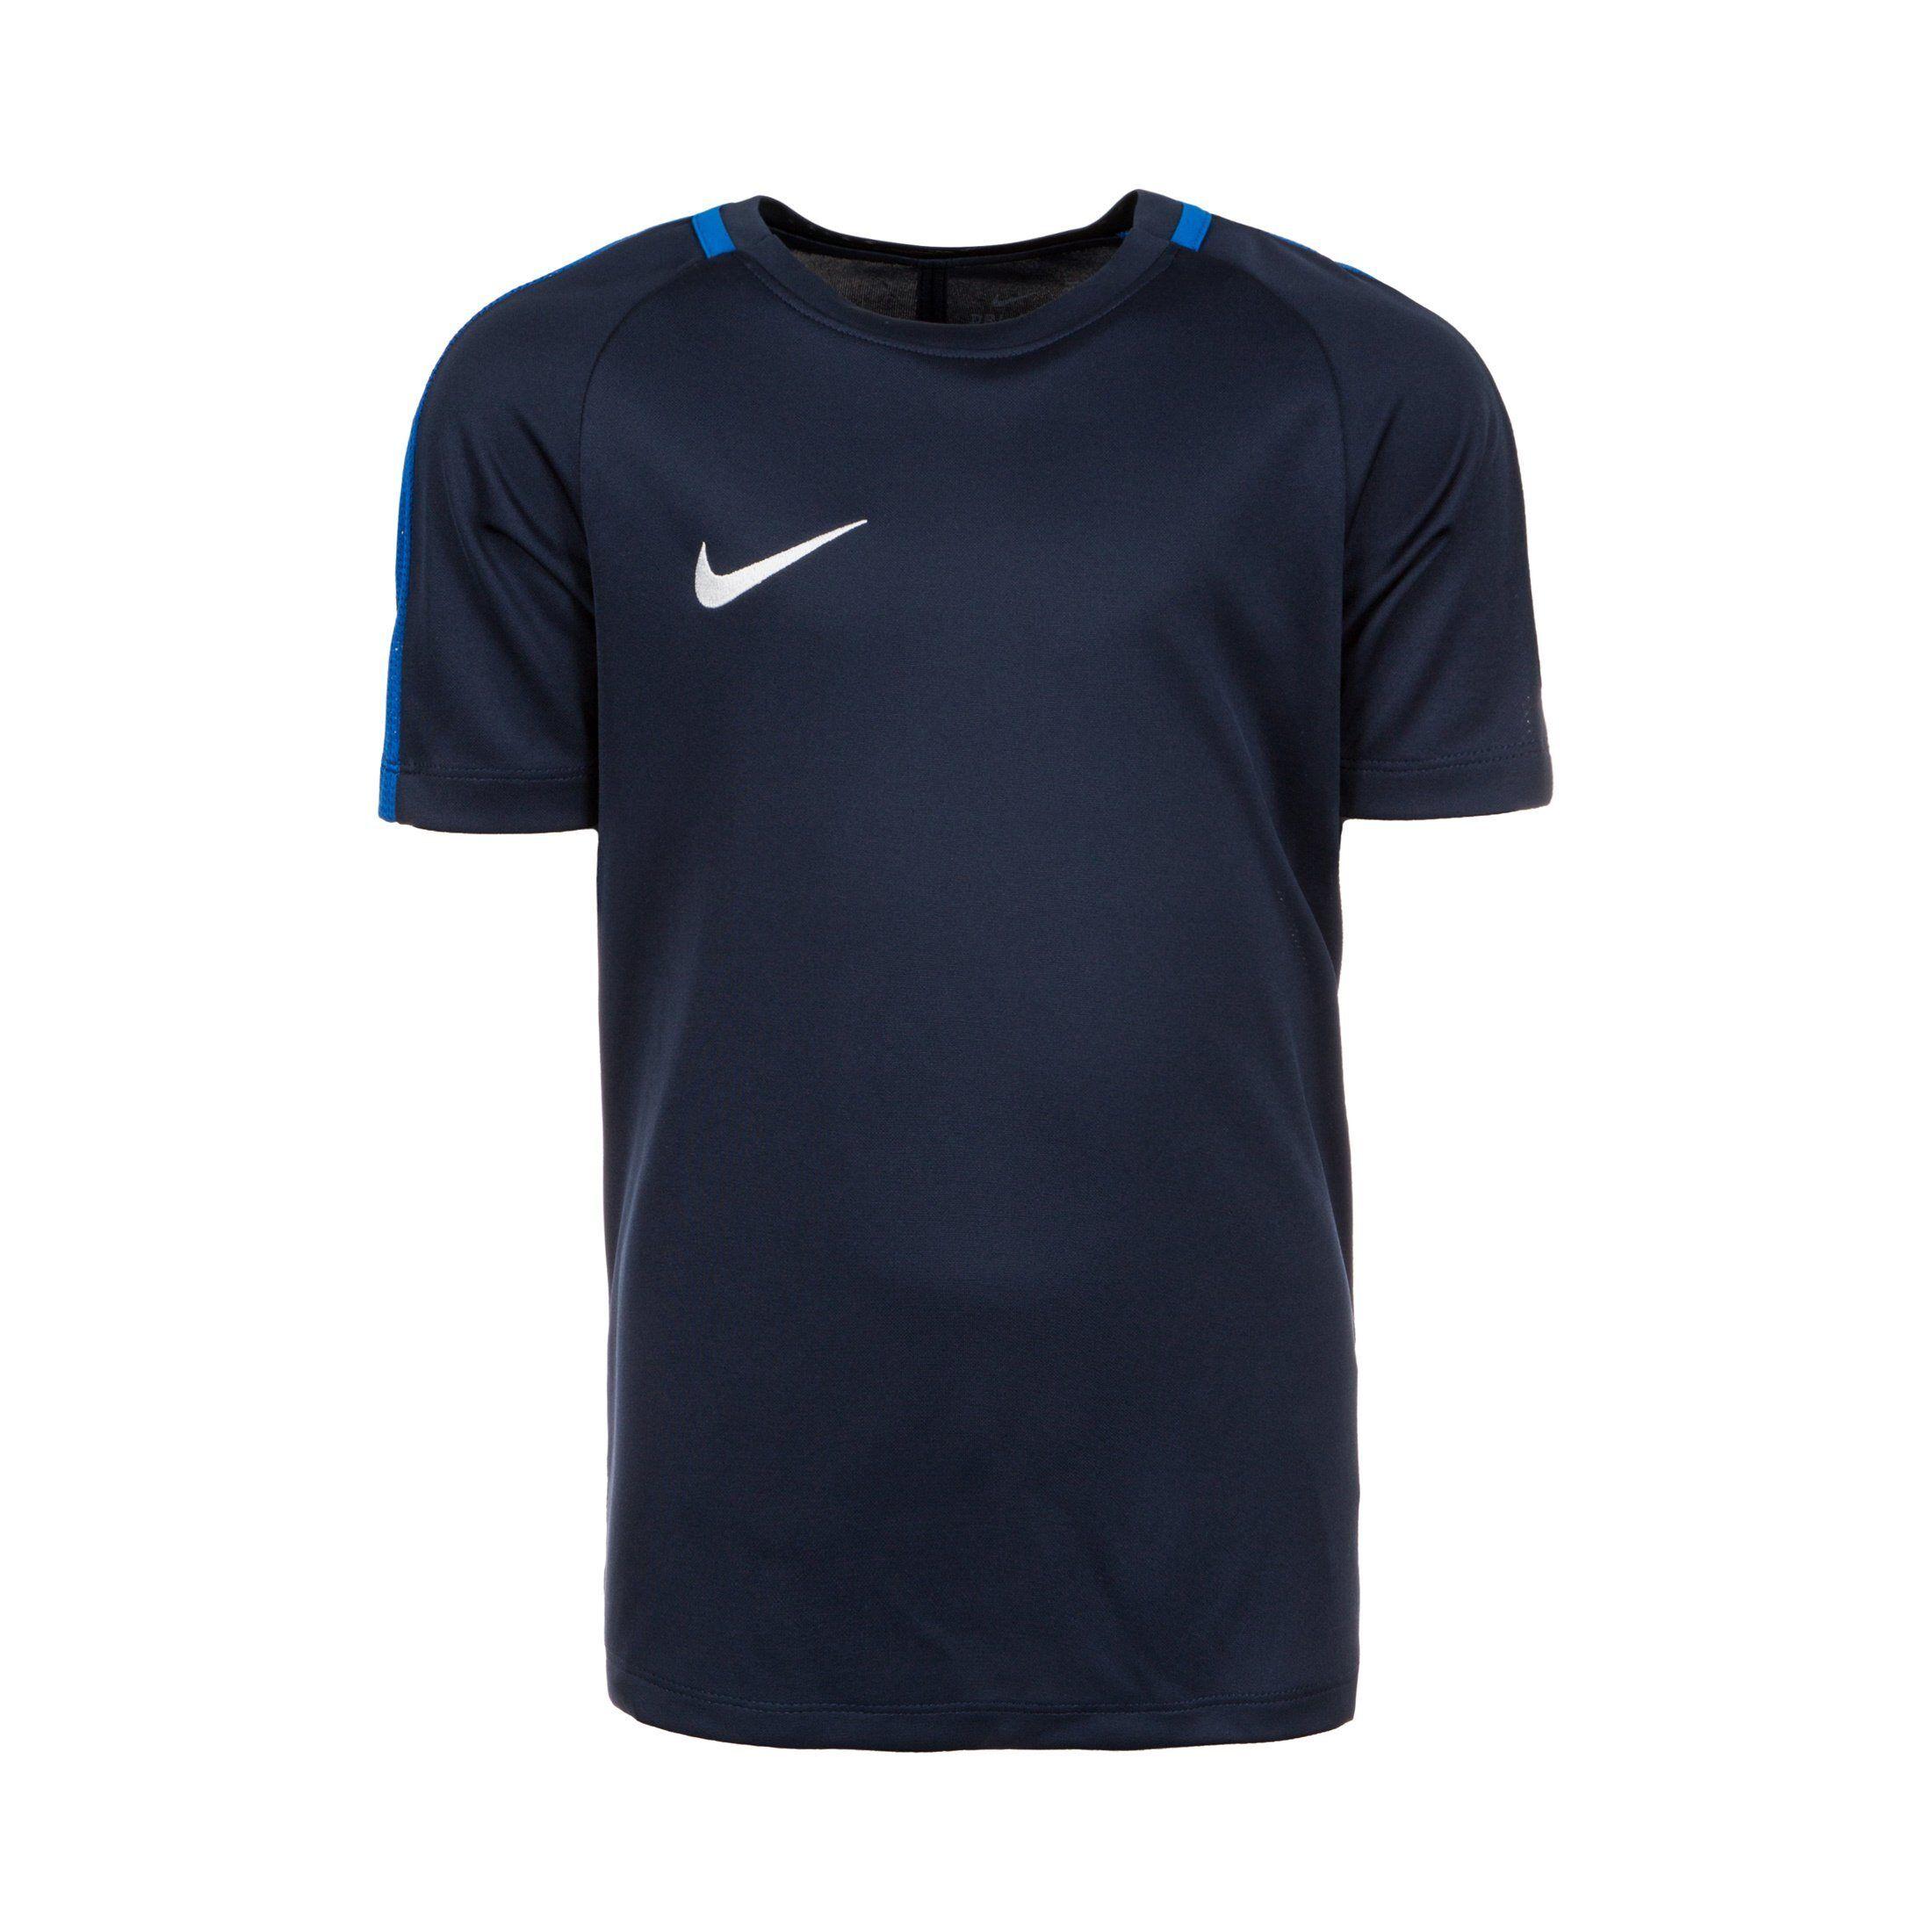 Nike Trainingsshirt »Dry Academy 18«, dunkelblau